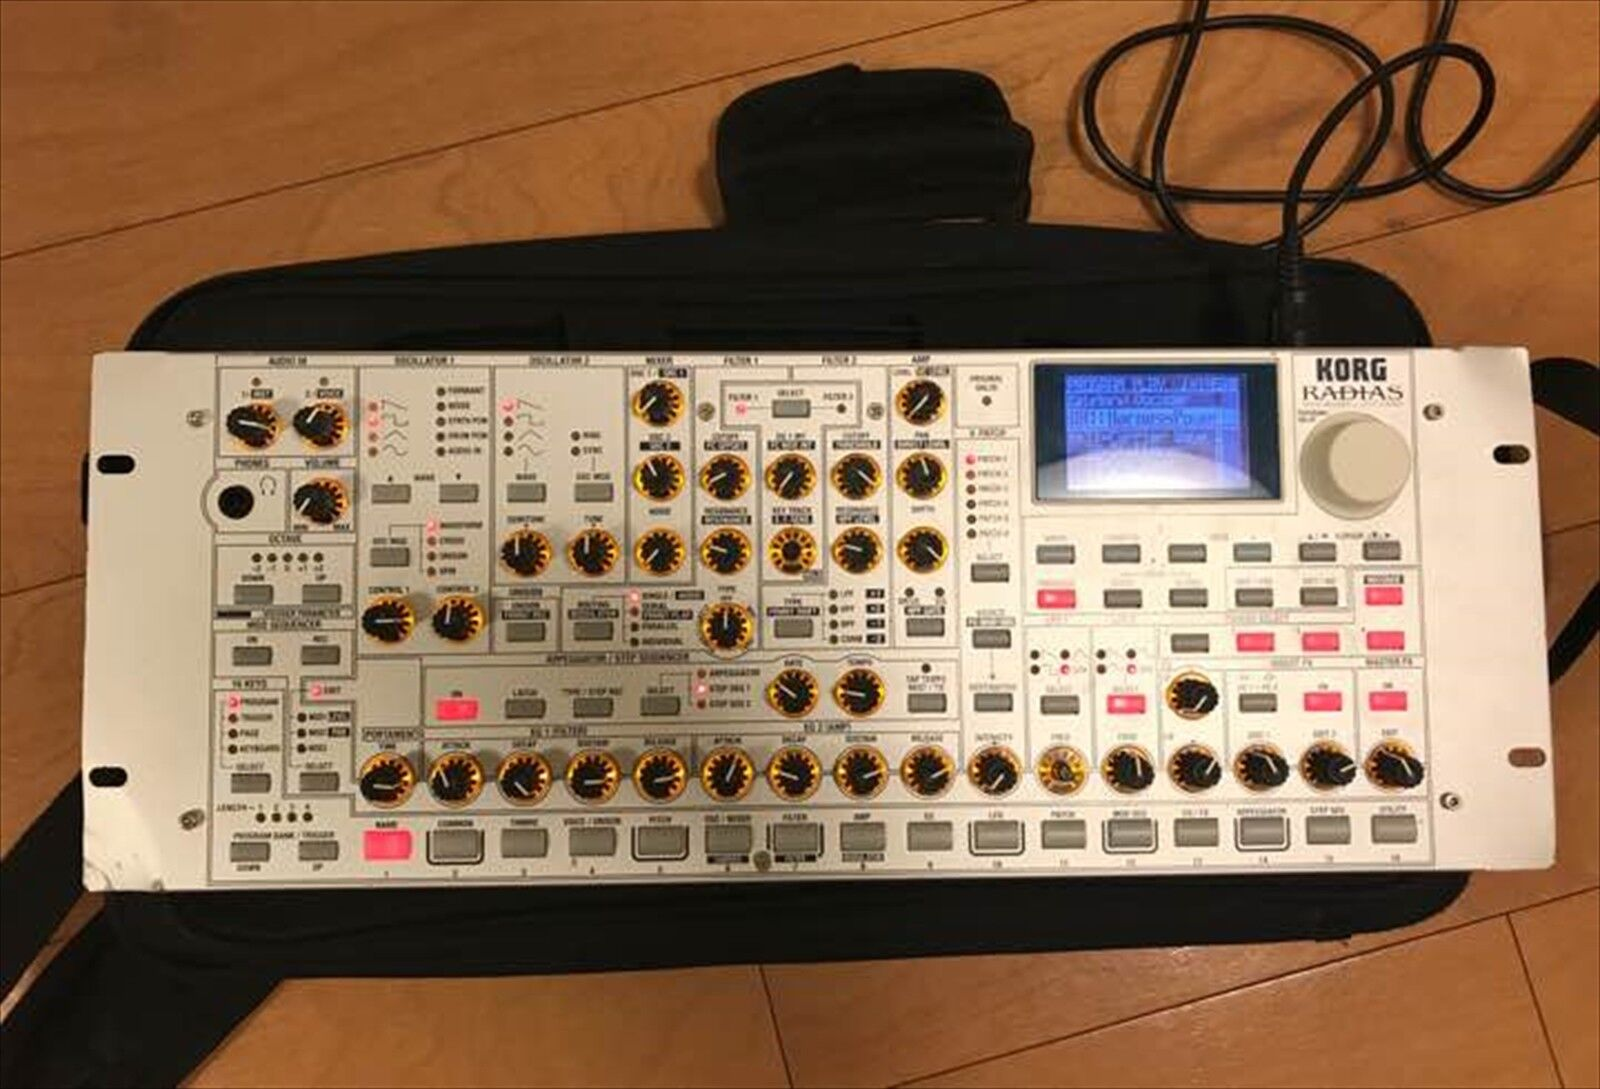 Used KORG RADIAS analog modeling syntheGrößer with soft case F S JAPAN